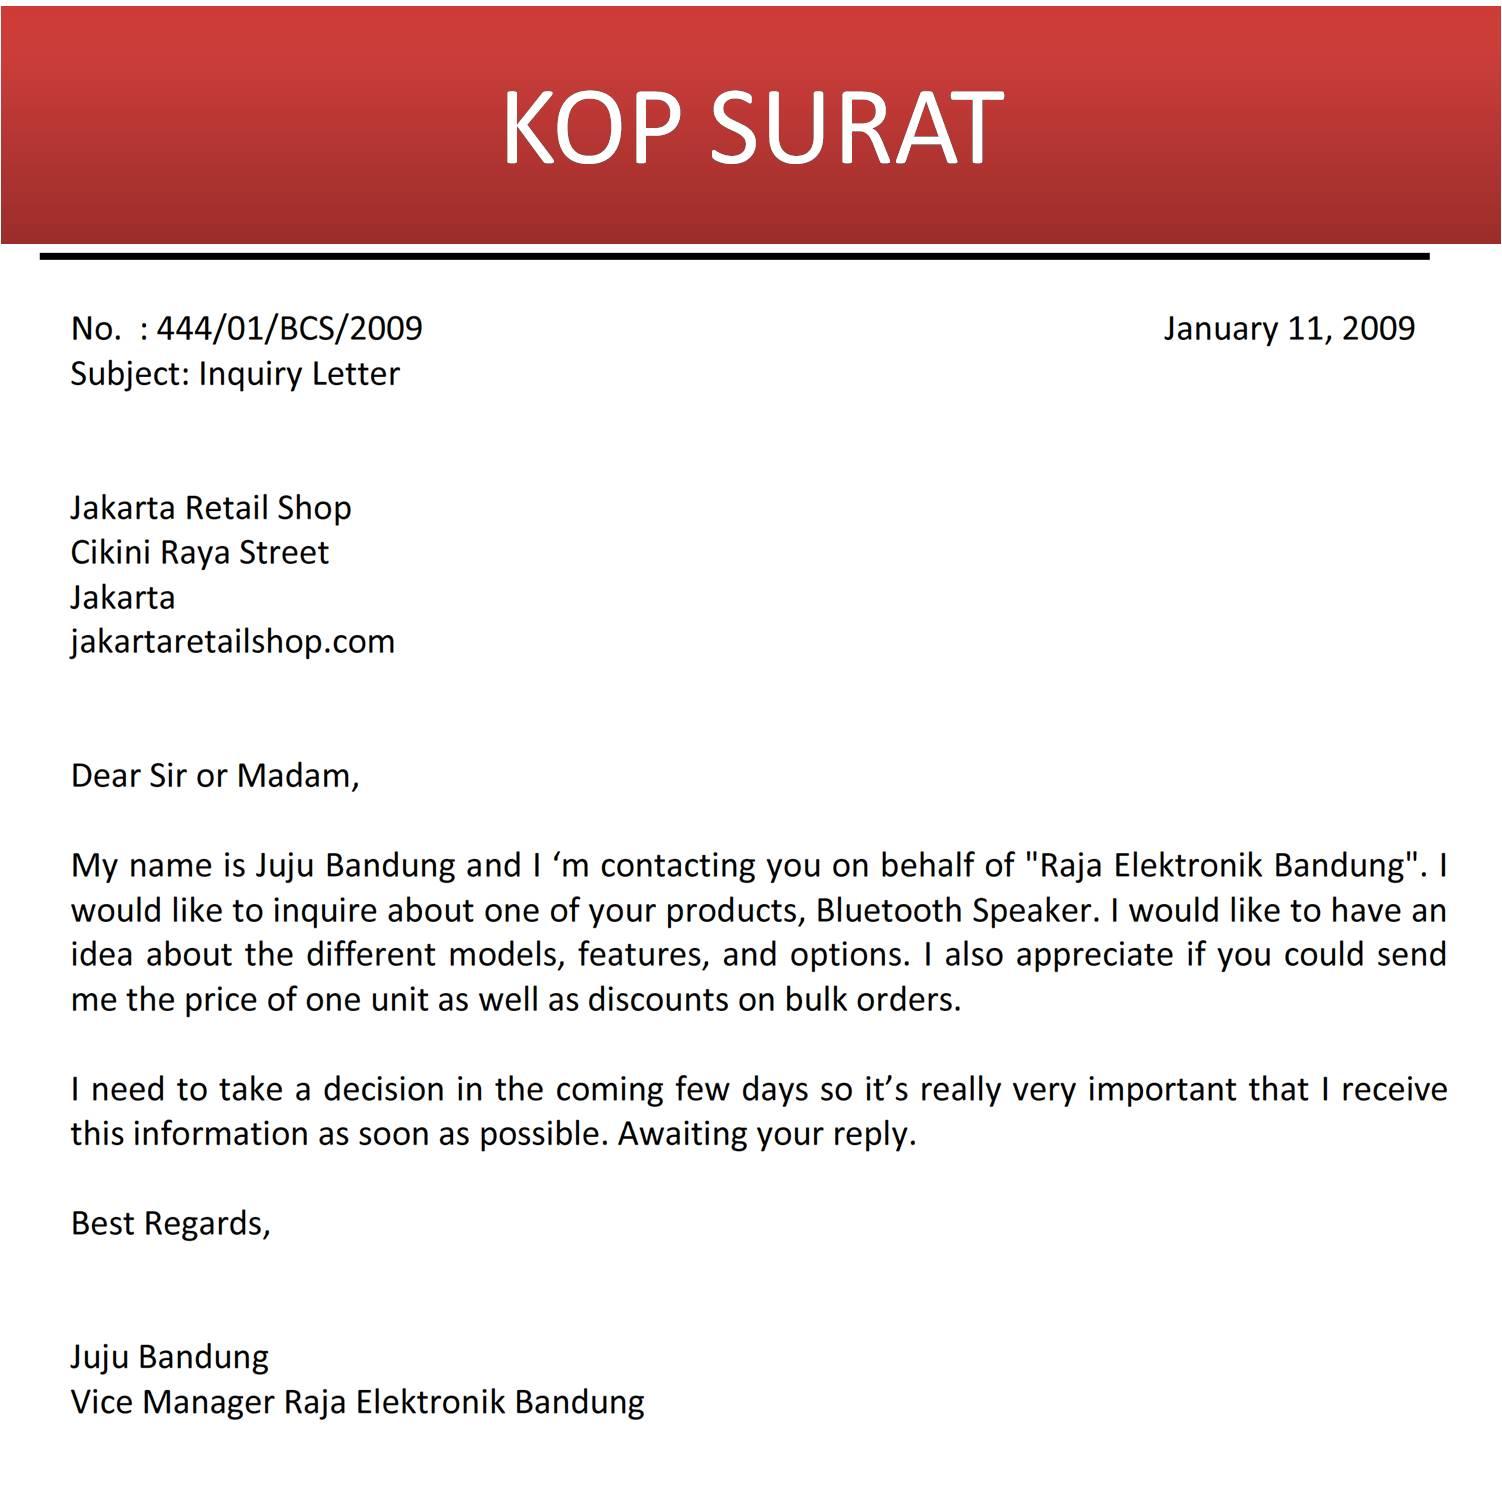 Surat Permintaan Informasi Produk Atau Jasa Bahasa Inggris Jujubandung